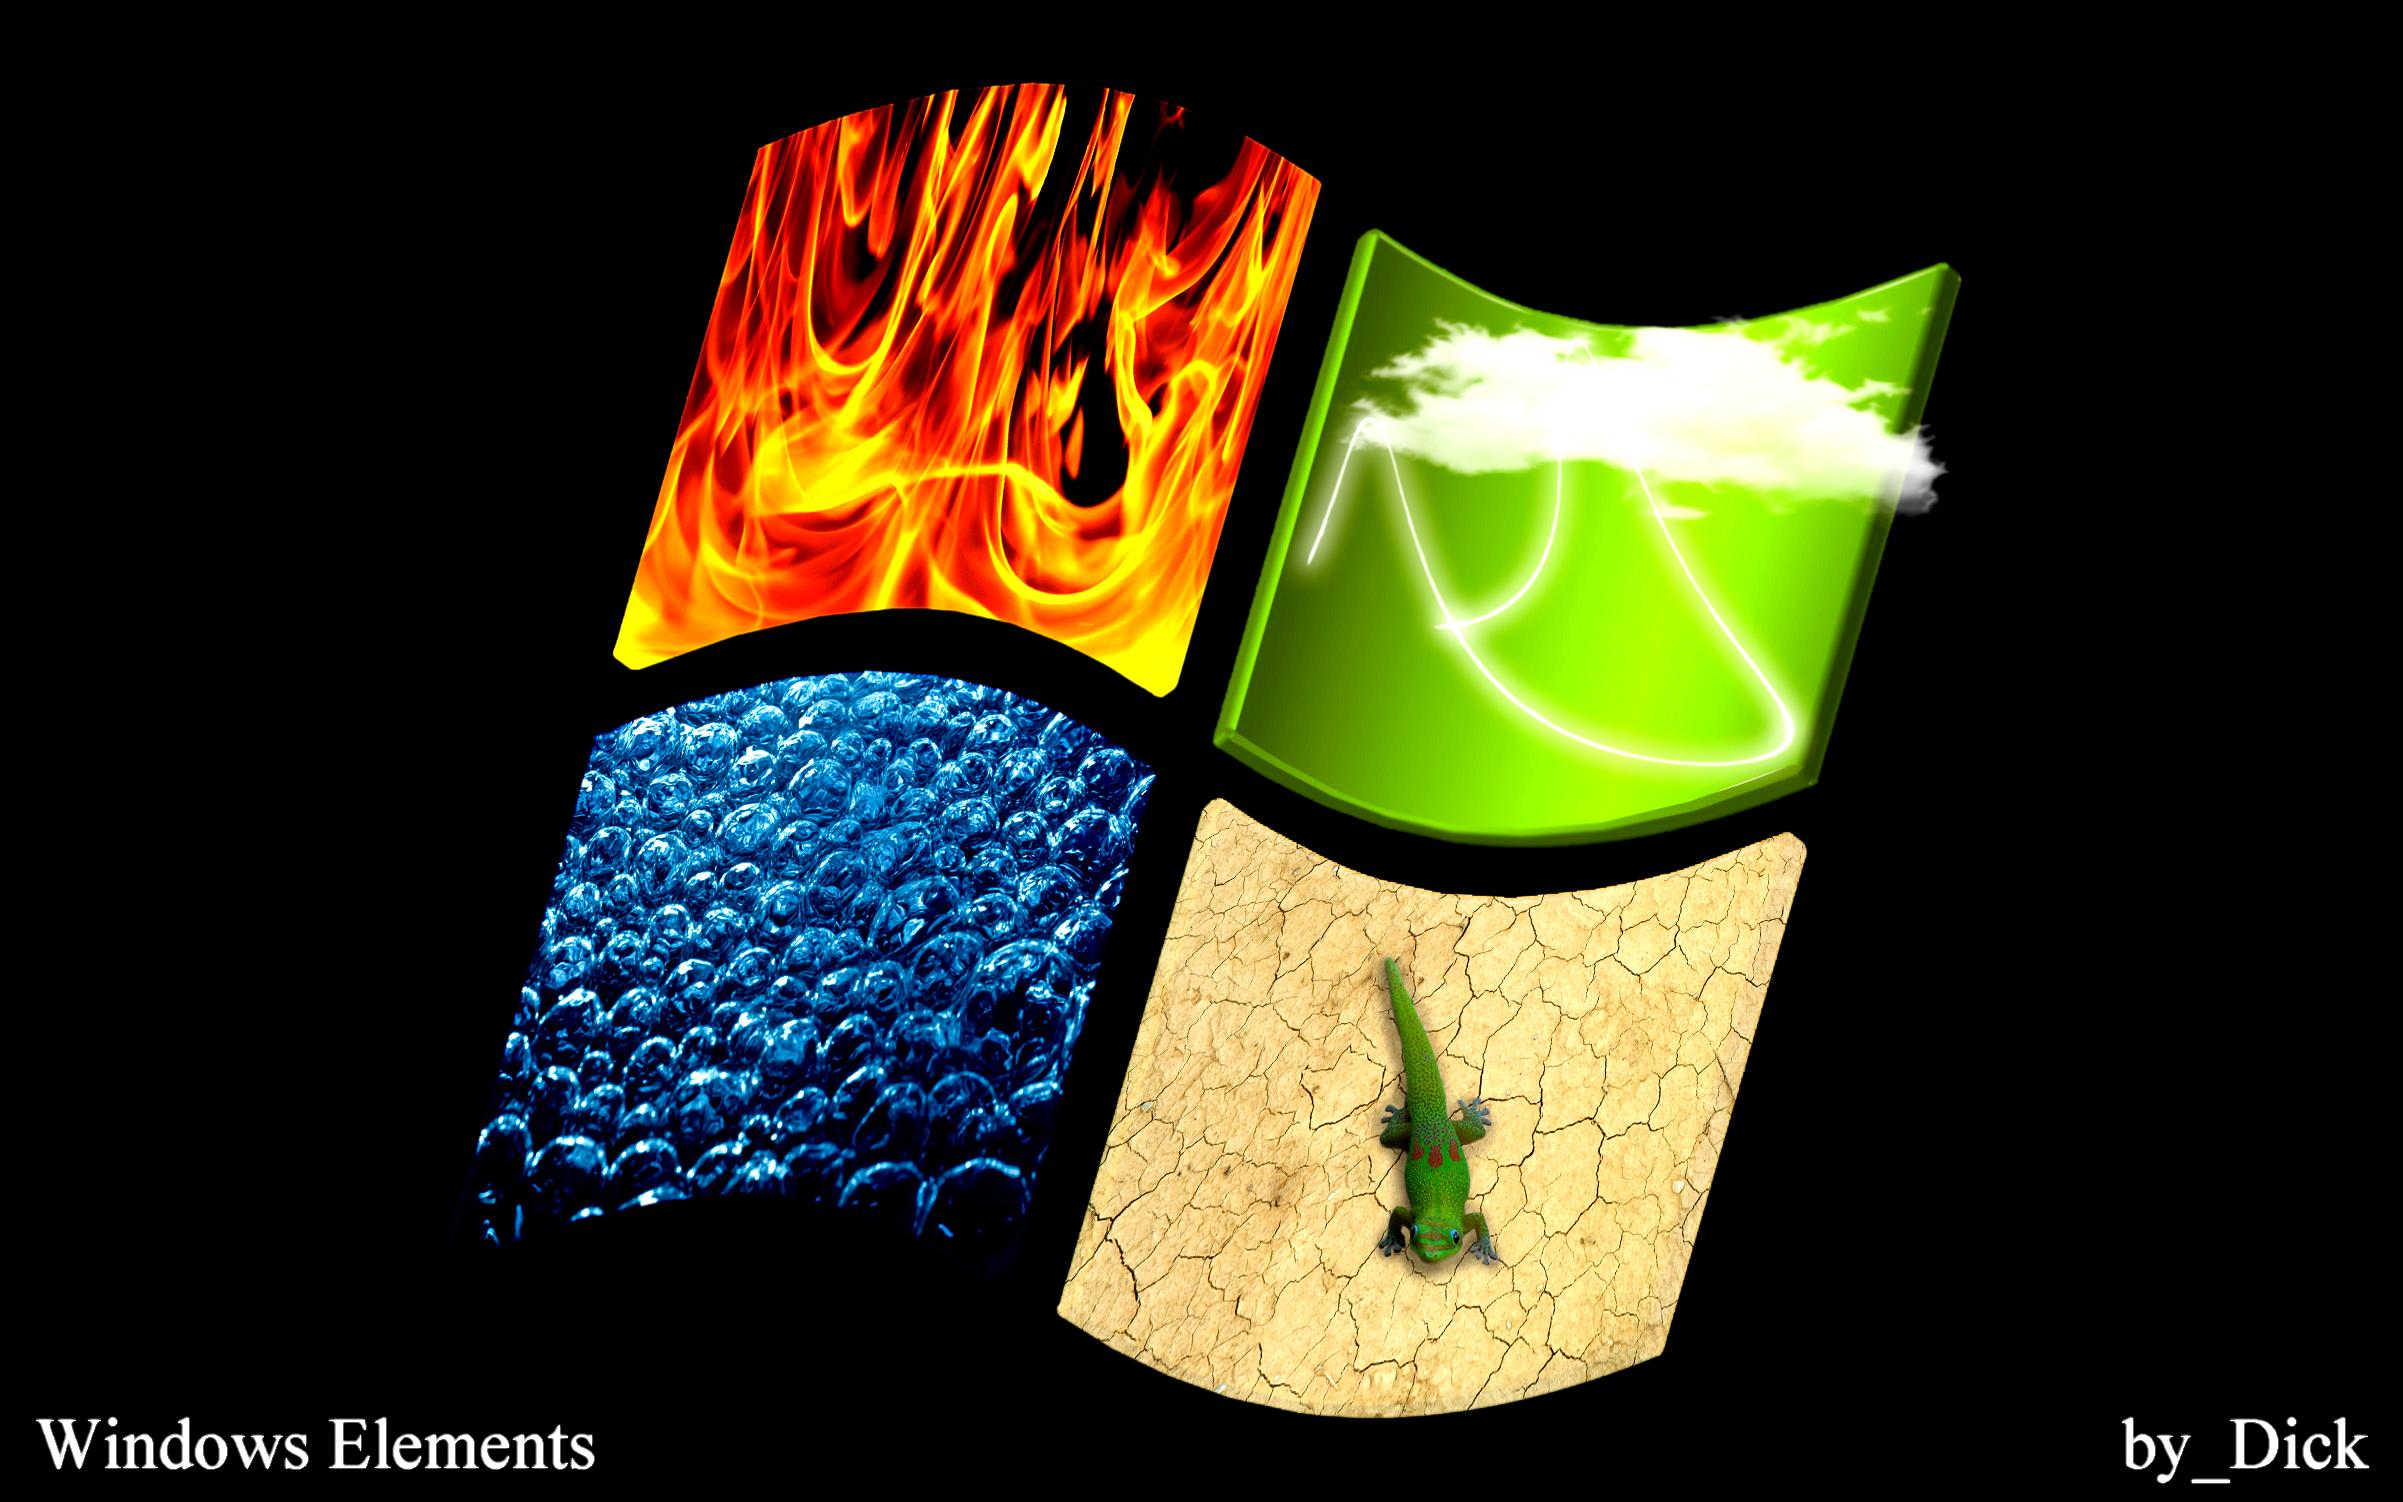 http://fc00.deviantart.net/fs50/f/2009/316/a/4/Windows_Elements_by_dickland.jpg